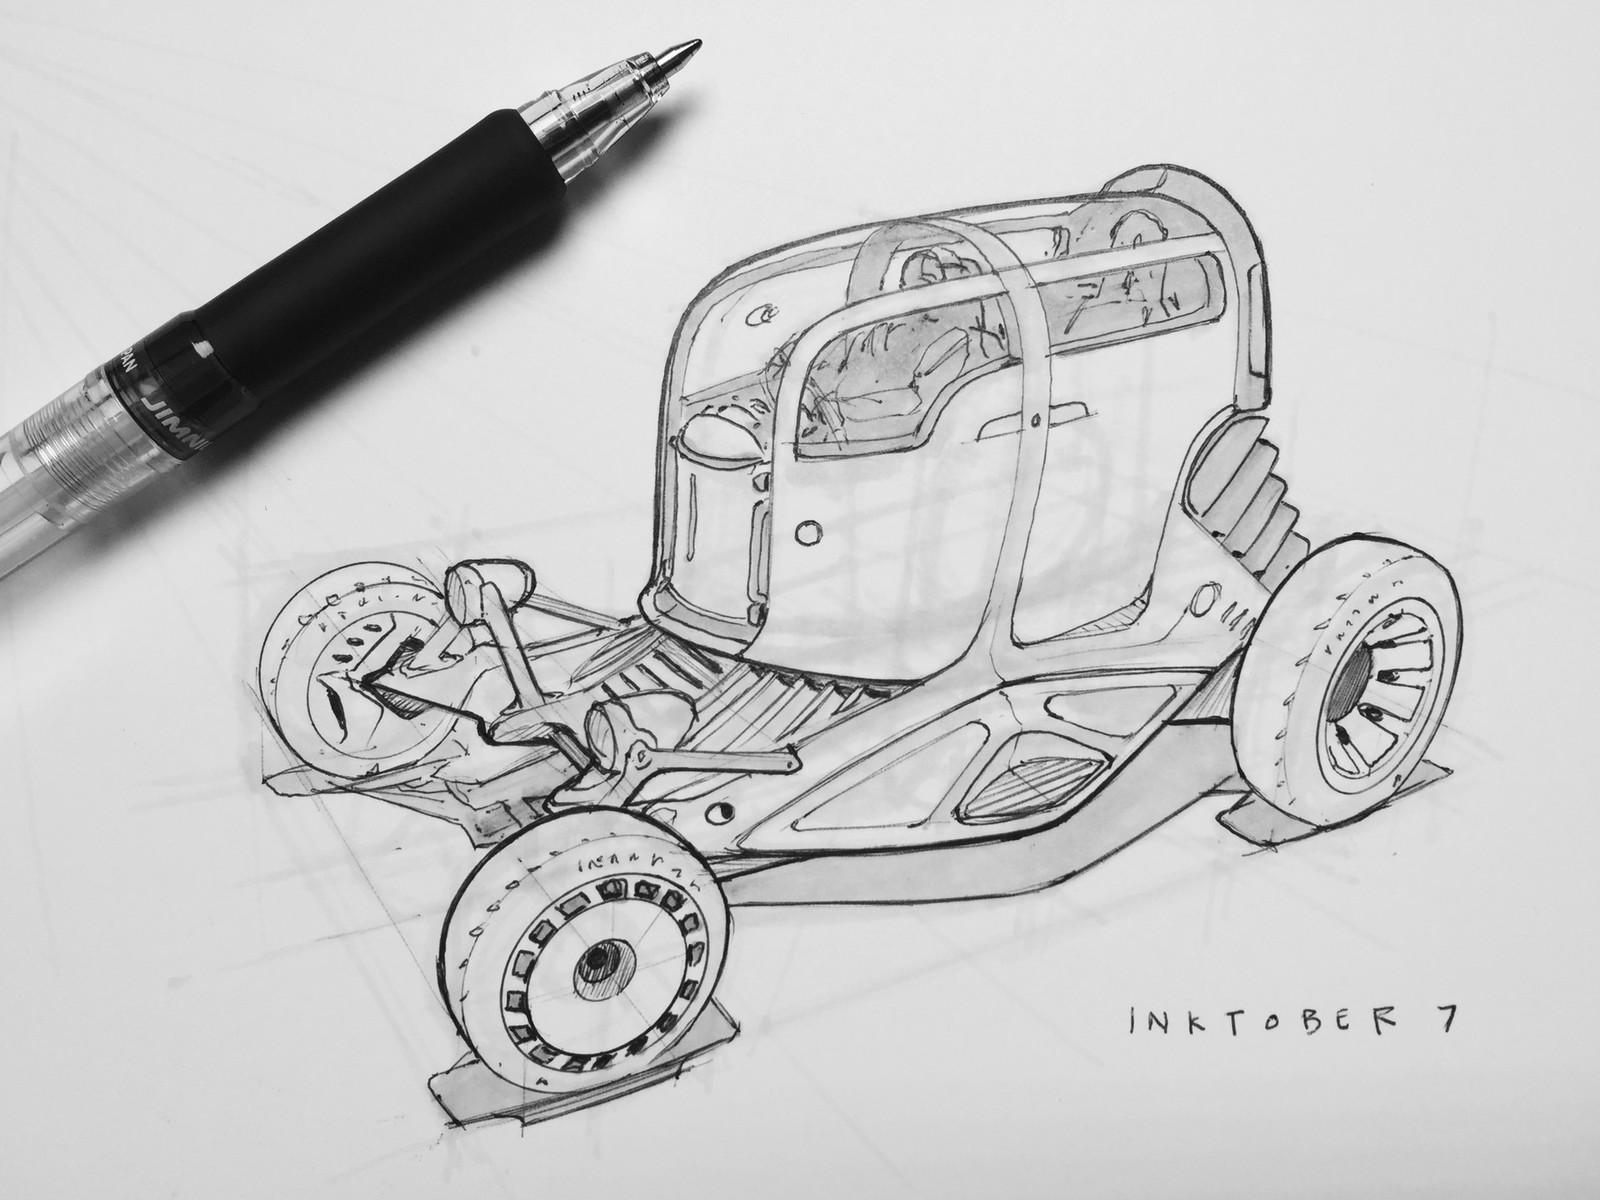 Original Scott robertson concept sketch.